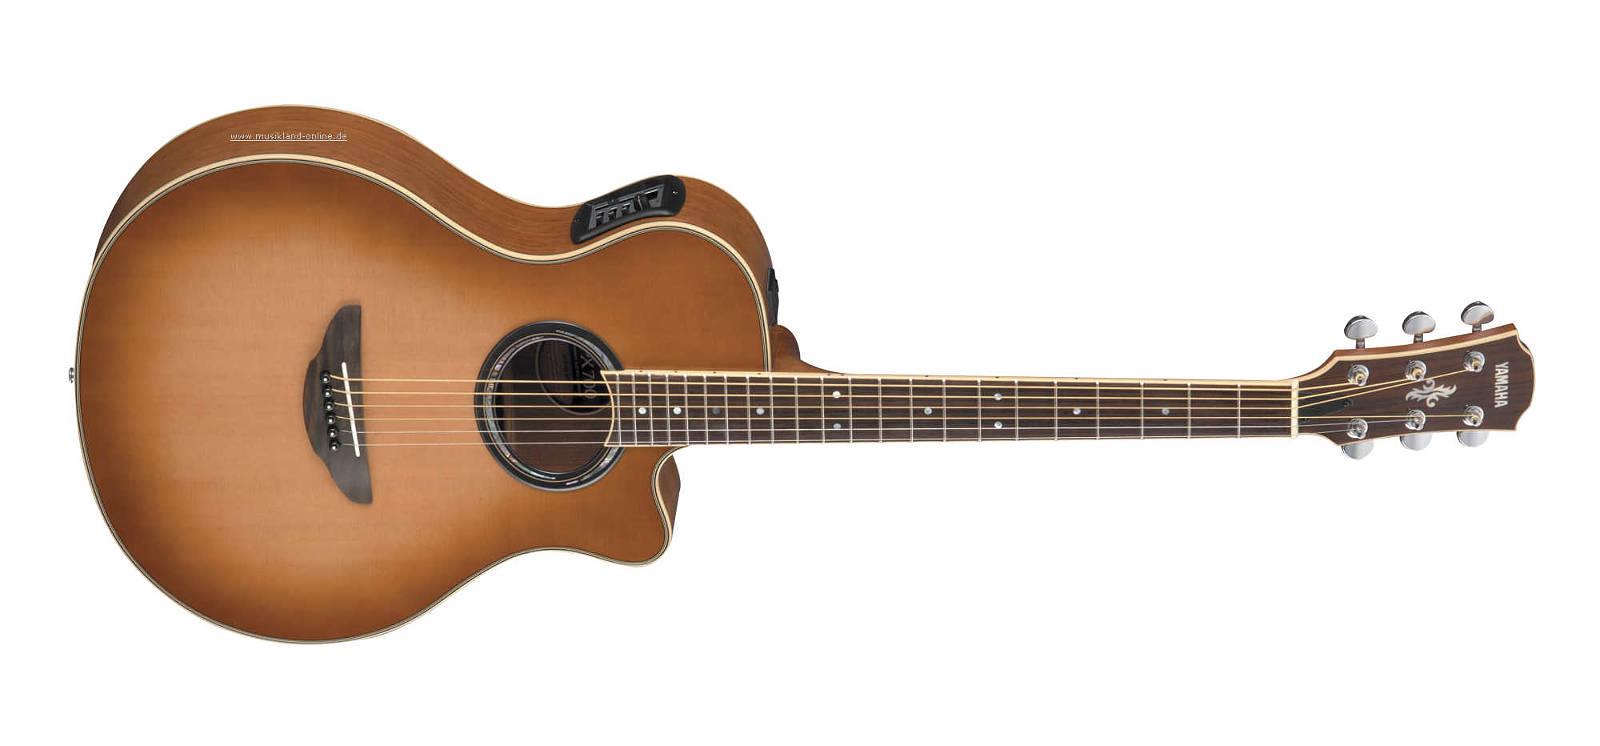 yamaha apx 700 sdb elektro akustik gitarre. Black Bedroom Furniture Sets. Home Design Ideas